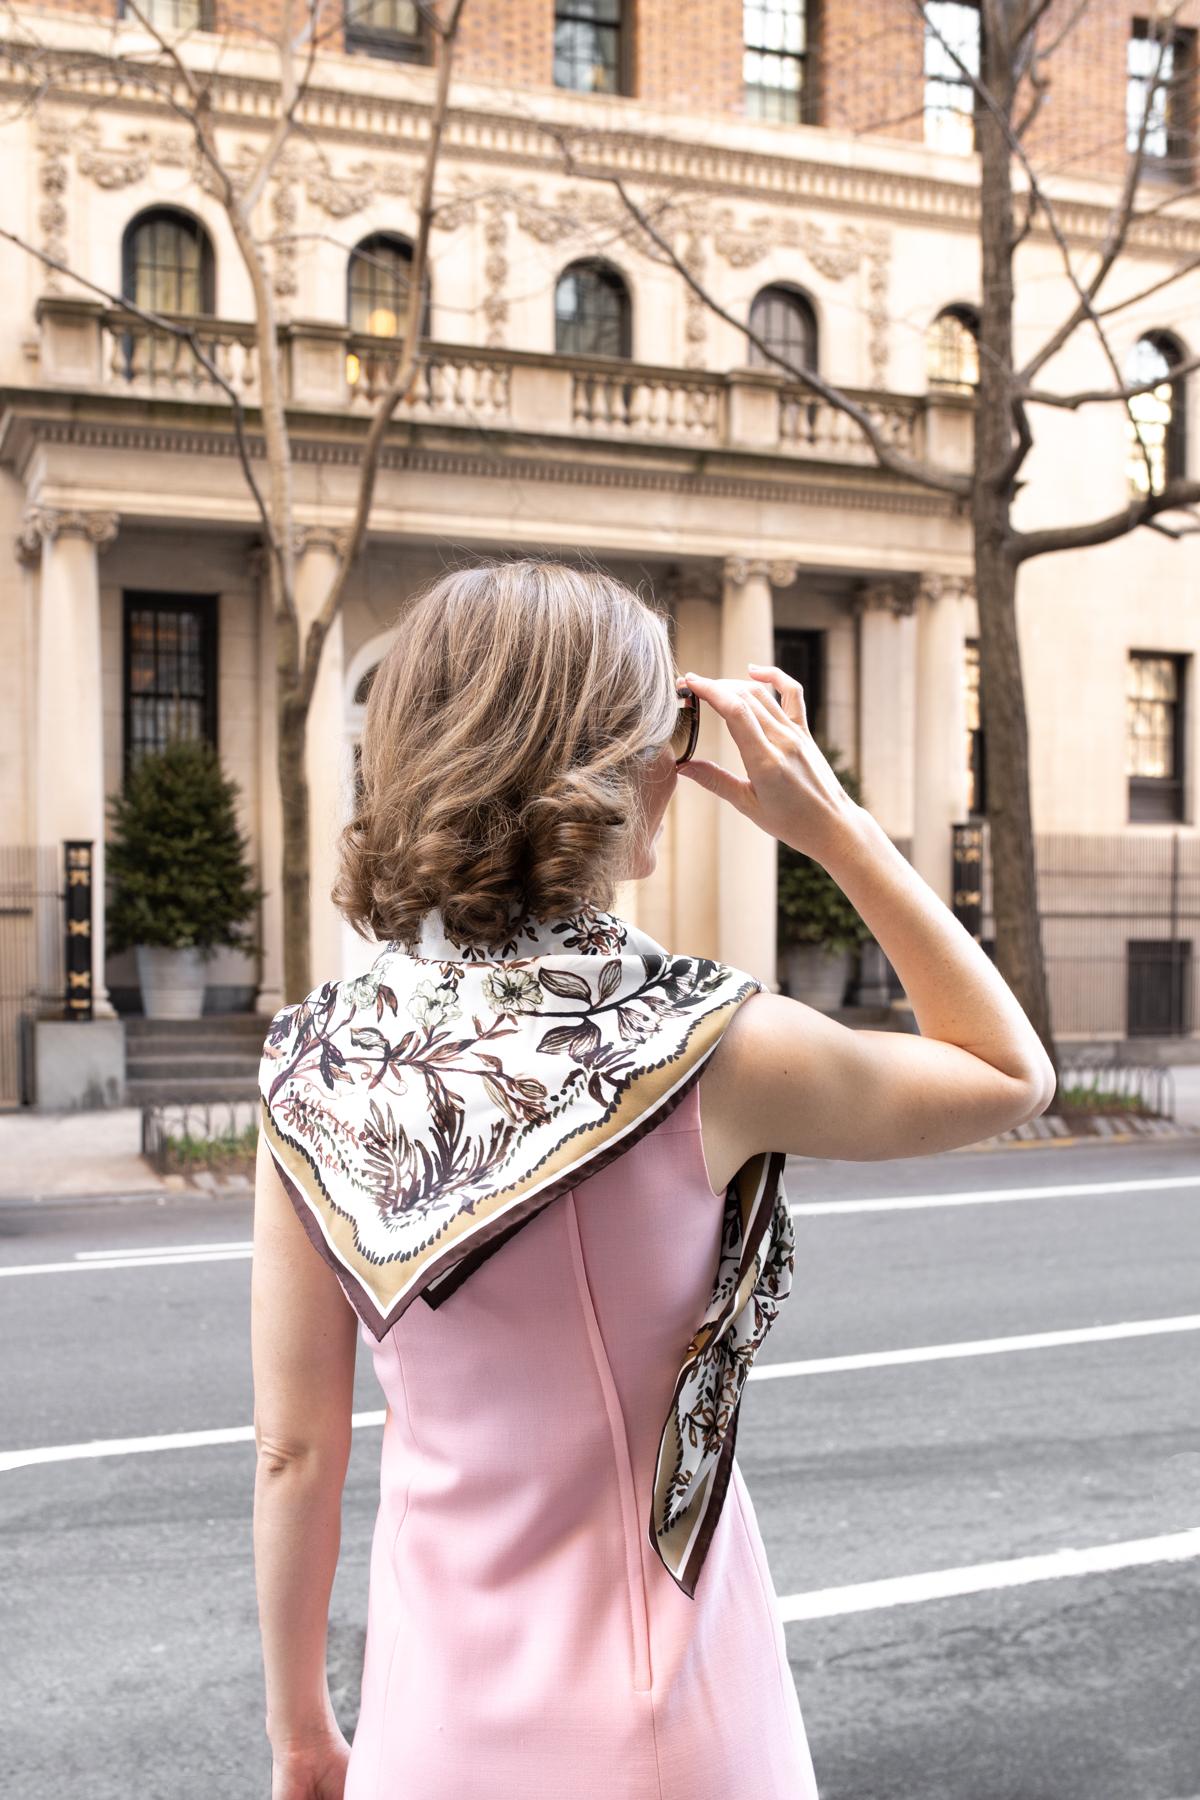 Stacie Flinner How to Style a Silk Scarf-20.jpg